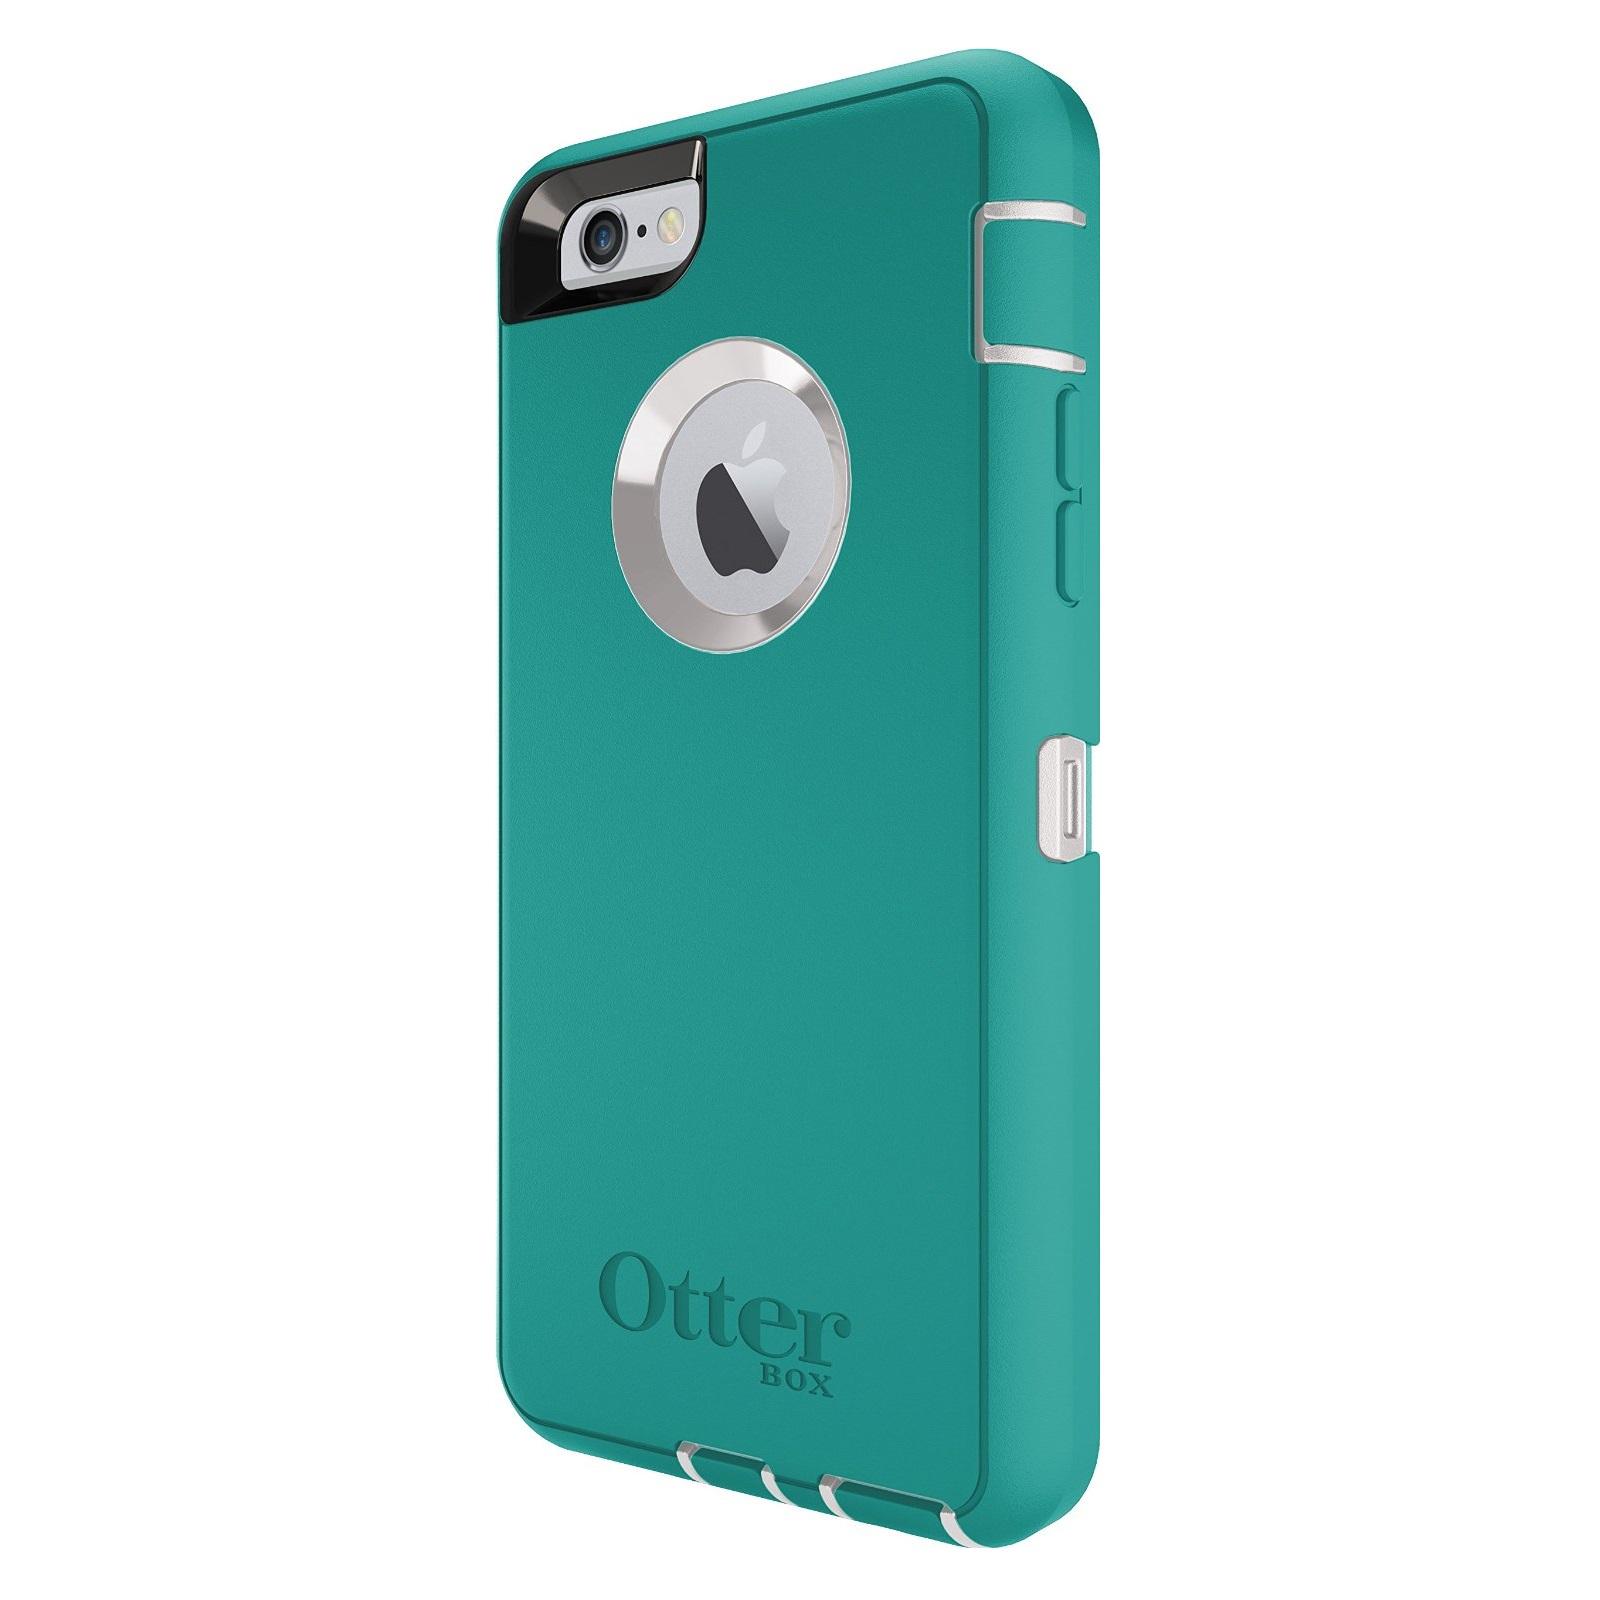 Otterbox Rugged Iphone